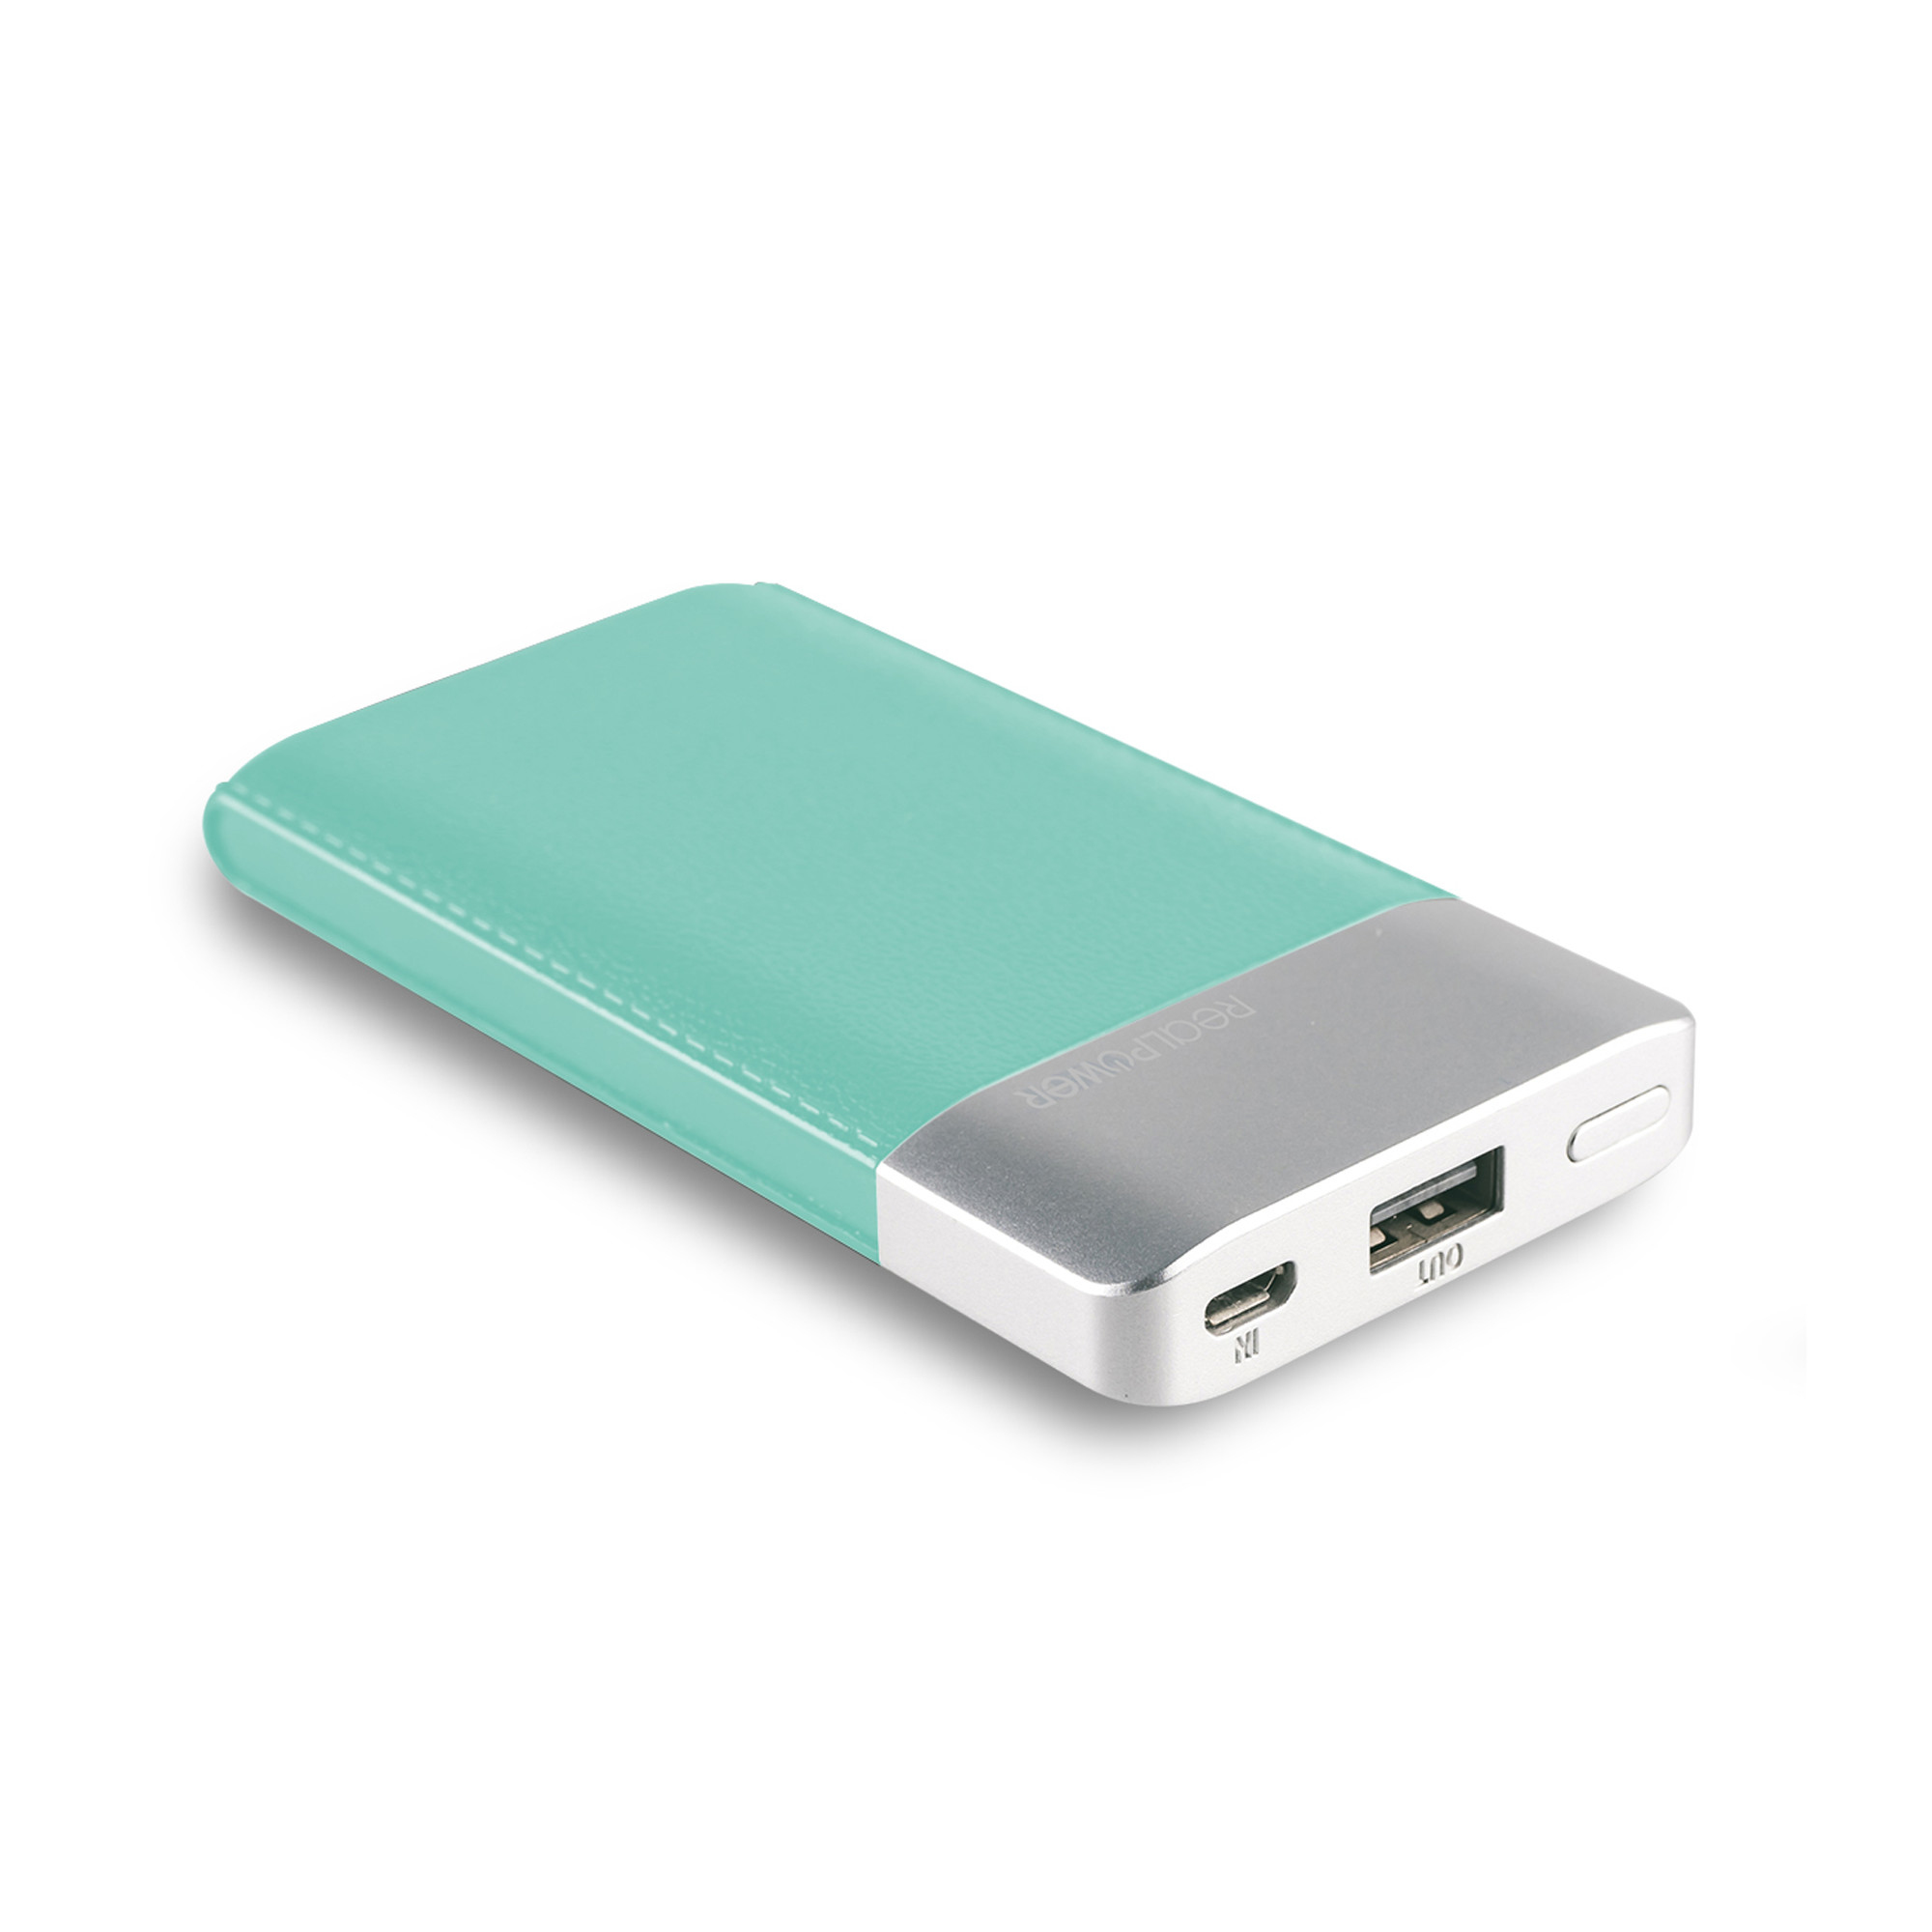 RealPower PB-4000 Fashion - Blau - Silber - Universal - Rechteck - Lithium Polymer (LiPo) - 4000 mAh - USB